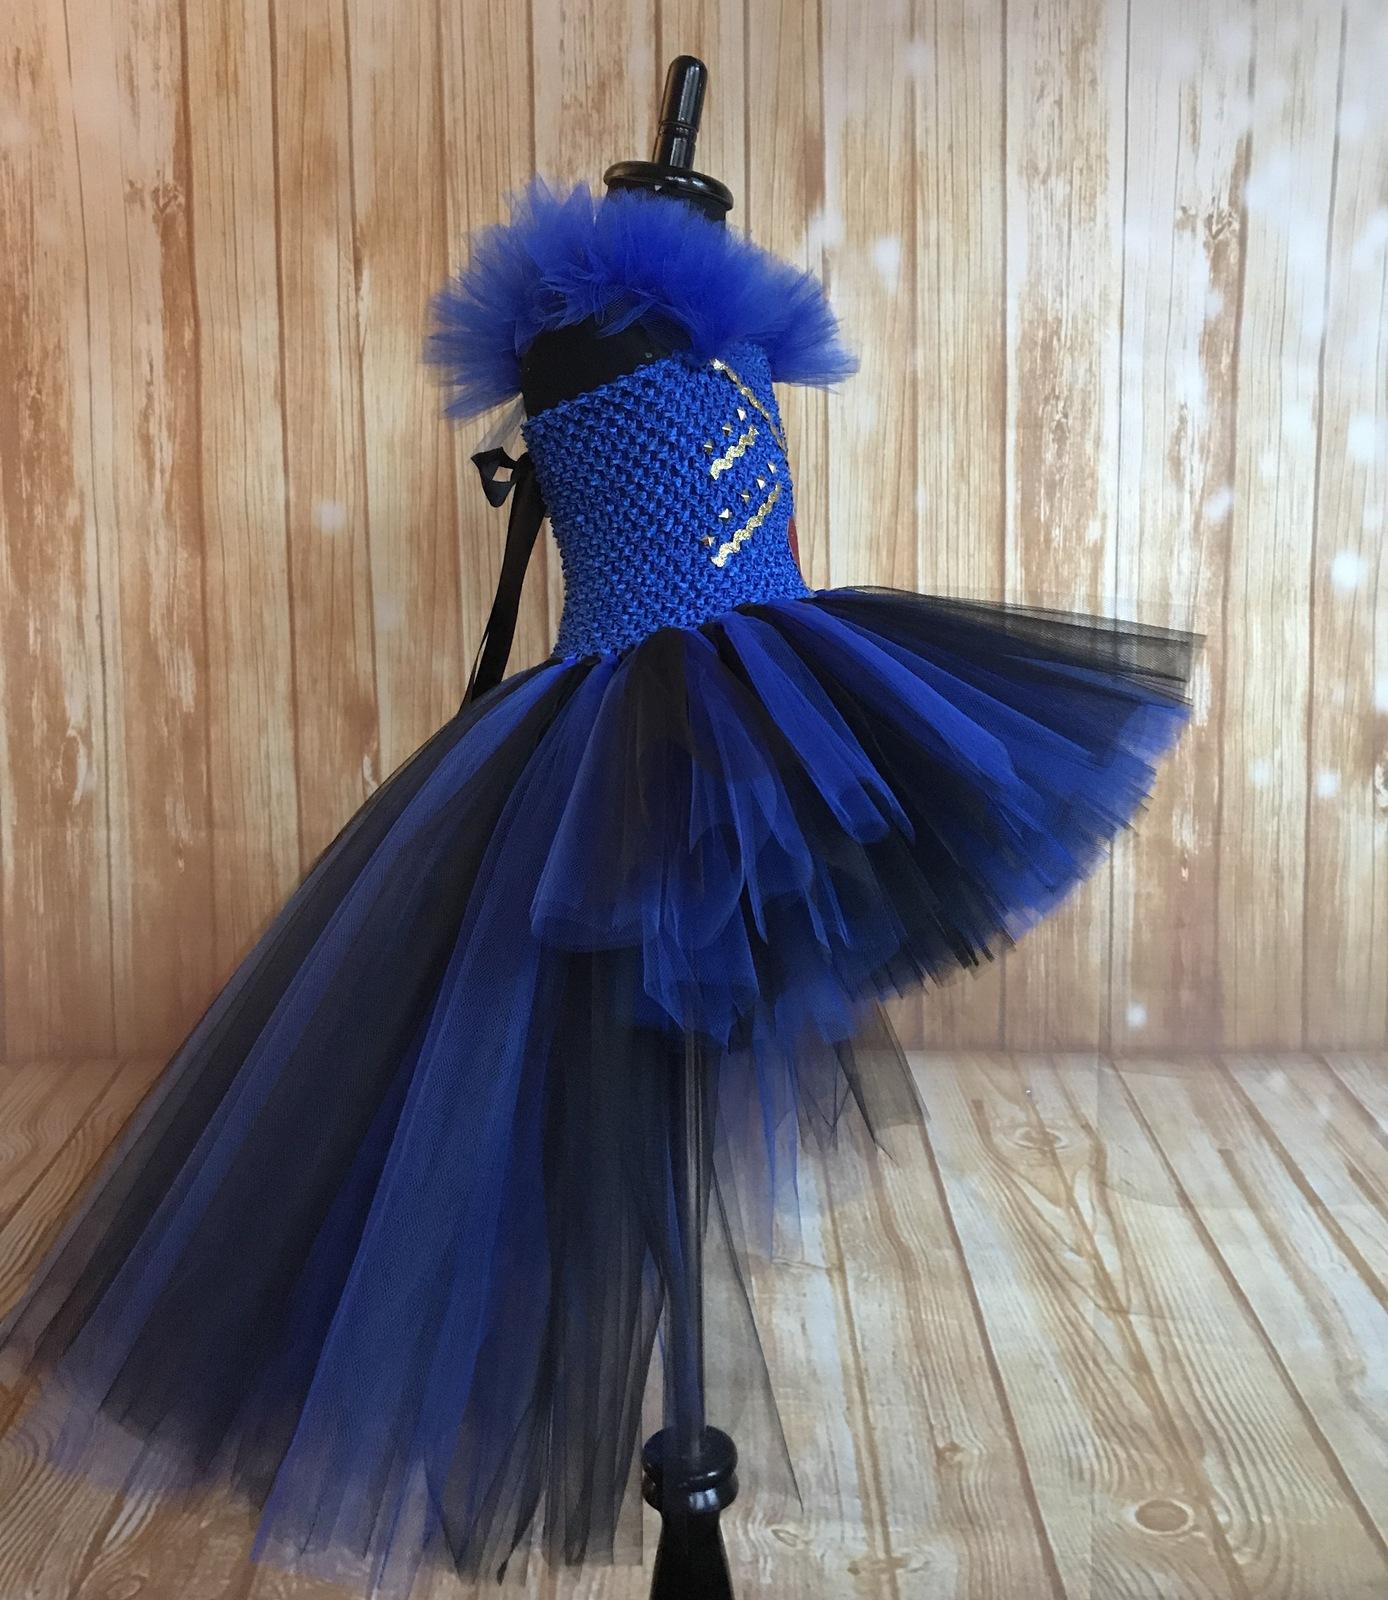 Evie Descendants High Low Tutu Dress, and 50 similar items